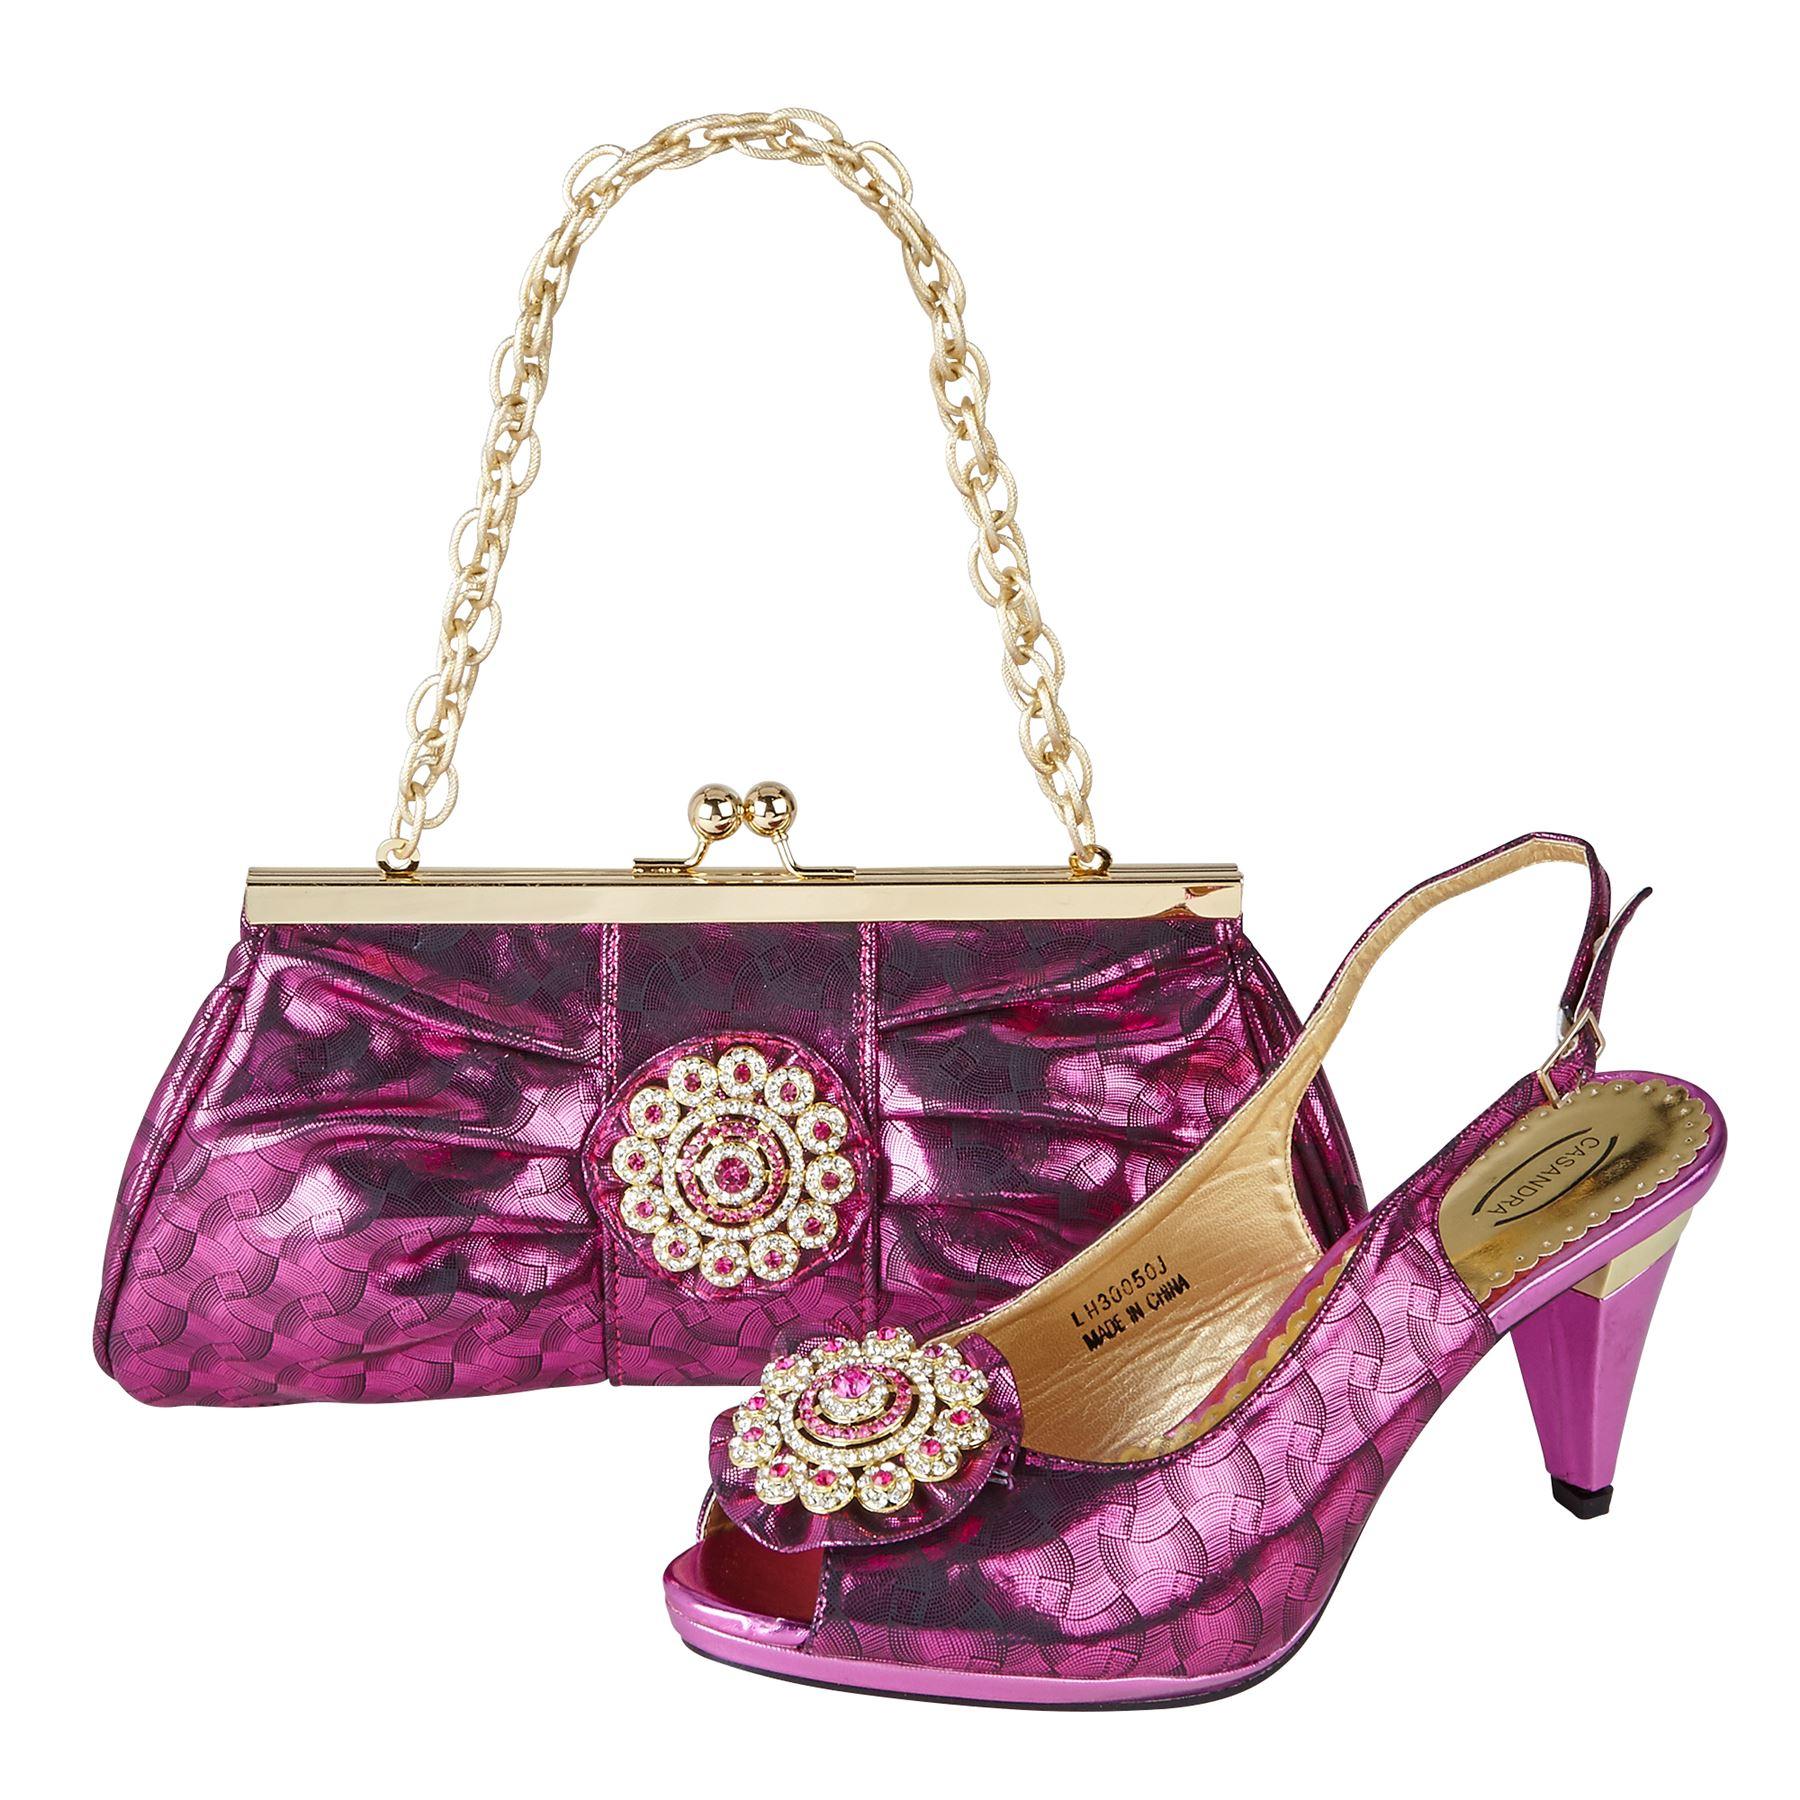 Wonderful LARA39s Summer New Women39s Sandal Shoes With Matching Handbags White